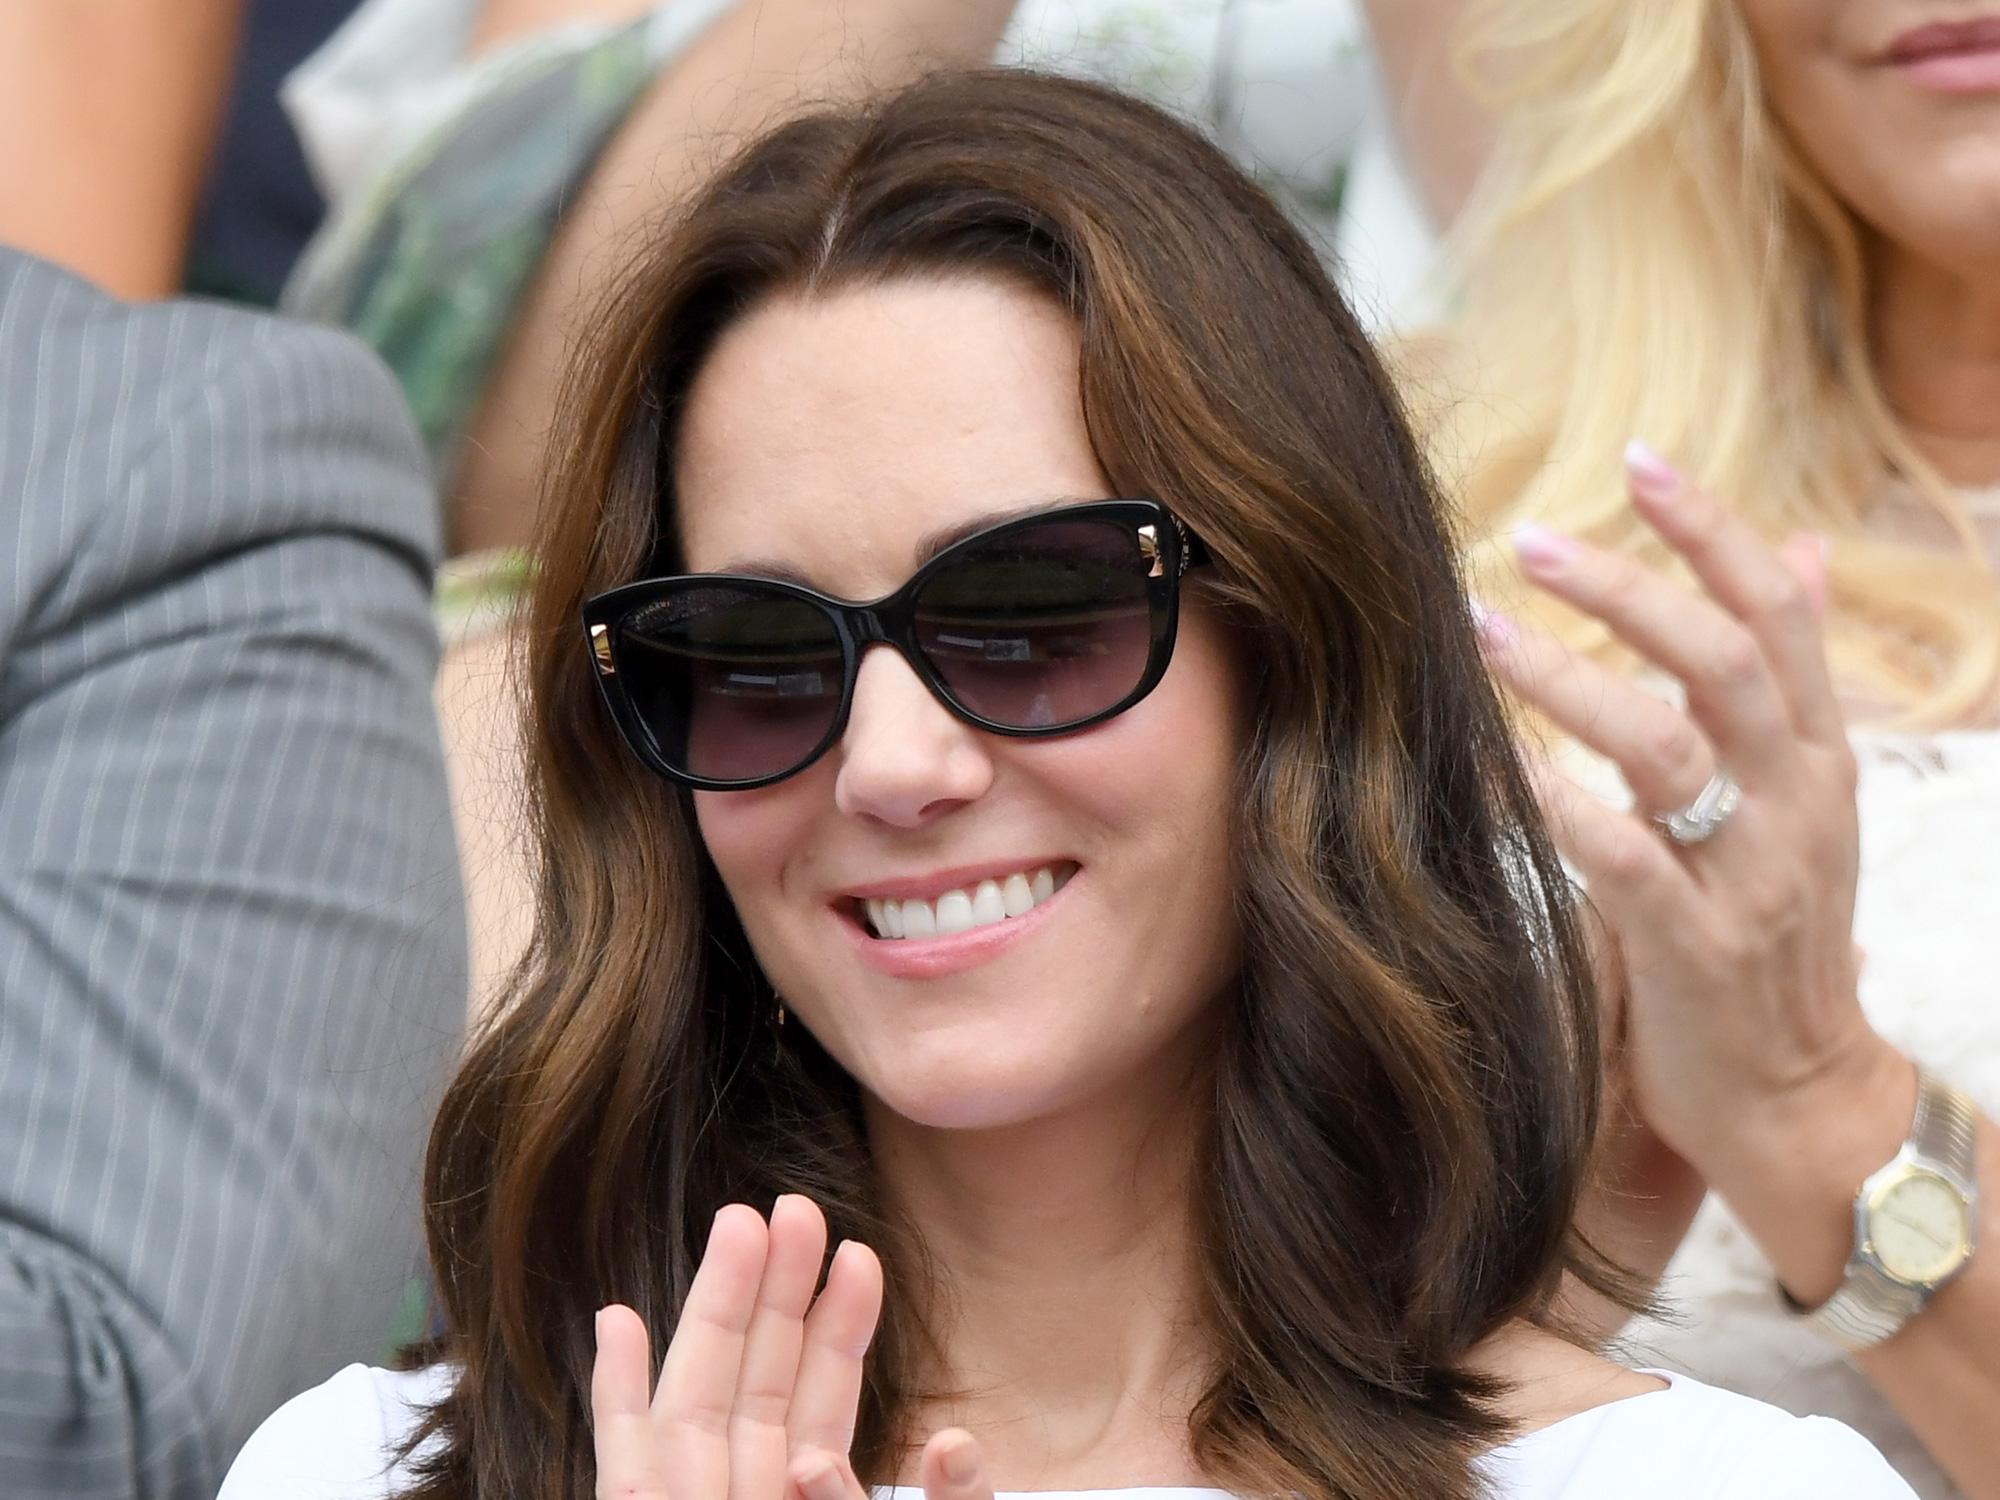 Kacamata Bulgari Pilihan Kate Middleton